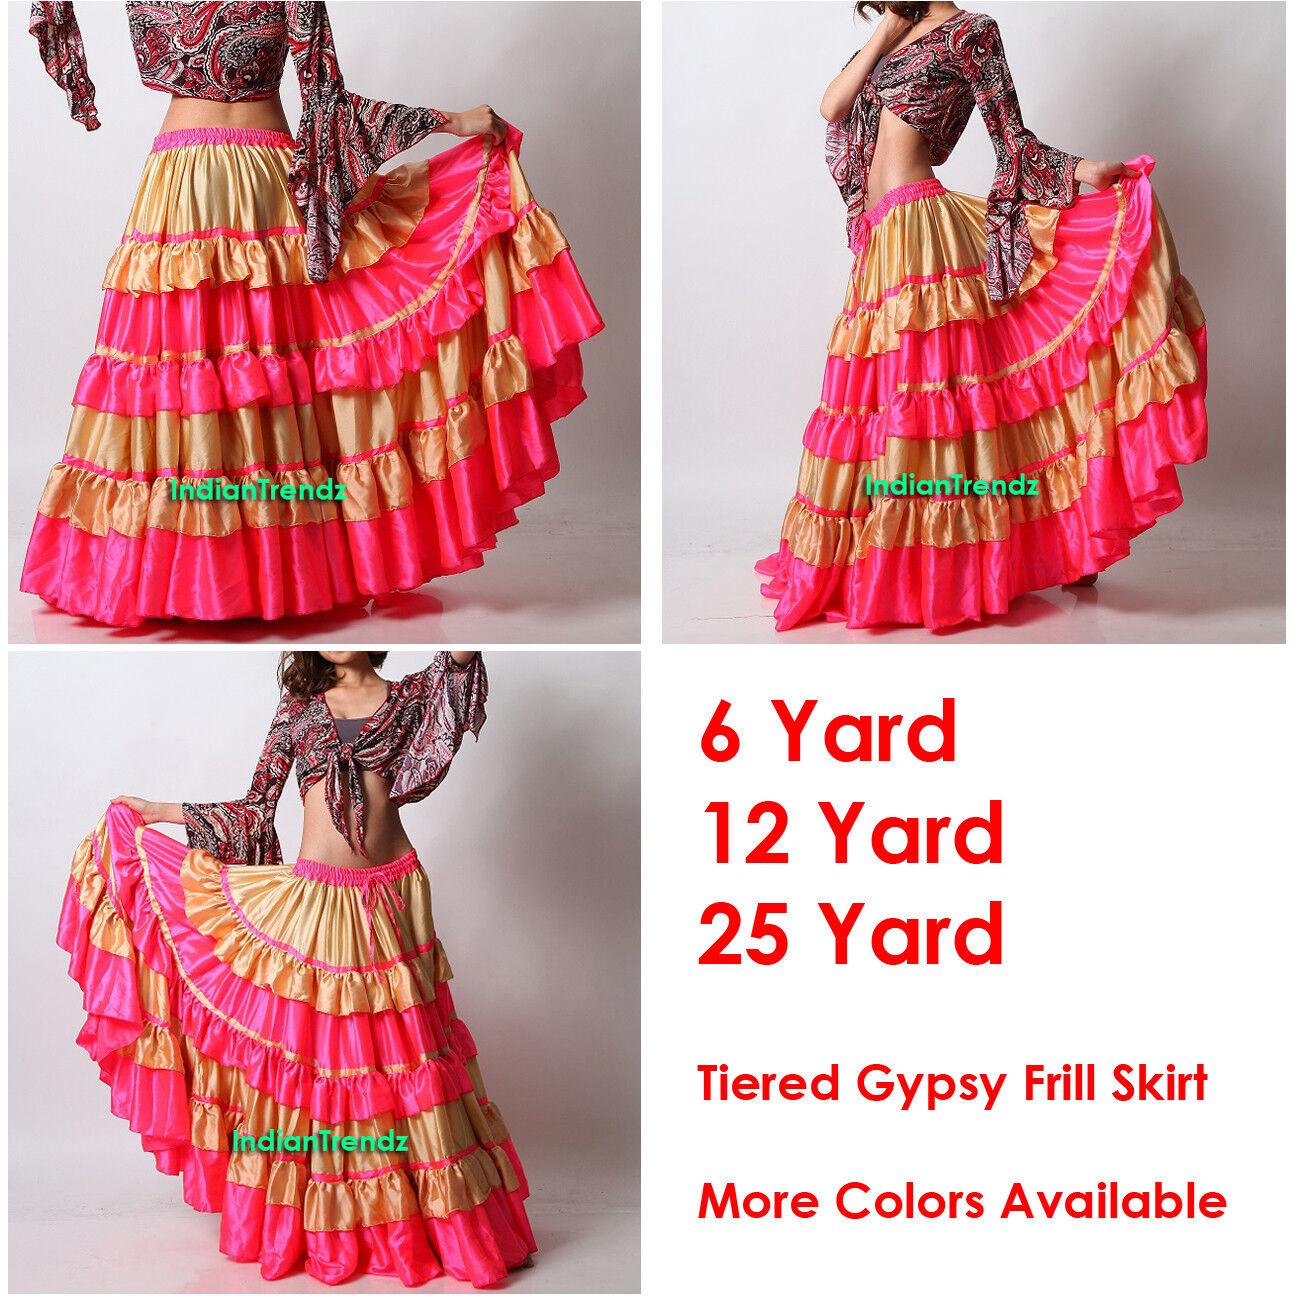 Lgold DeepPink Satin 6 12 25 Yard Tiered Gypsy Frill Skirt Belly Dance Flamenco